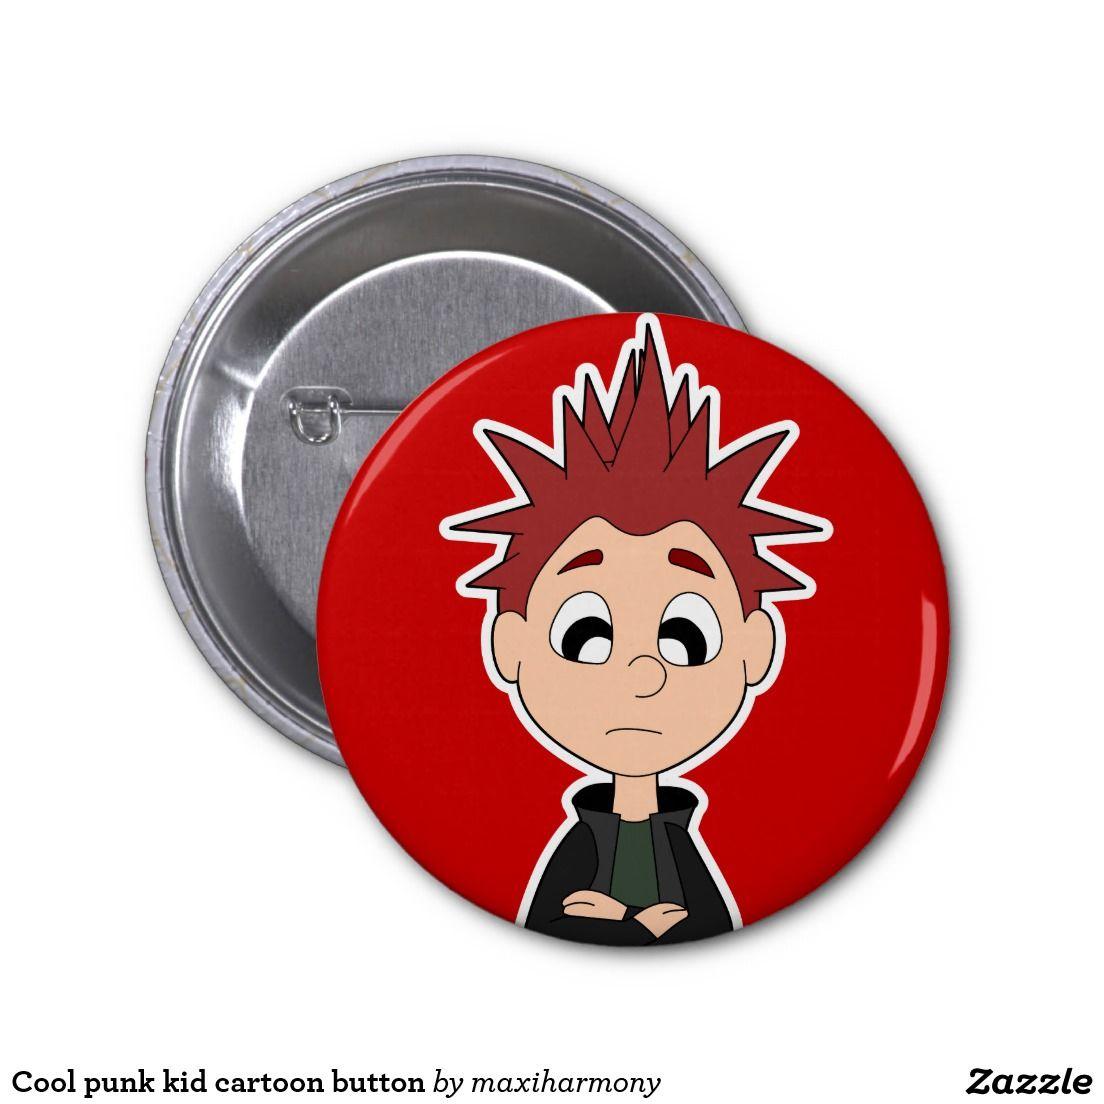 Cool punk kid cartoon button